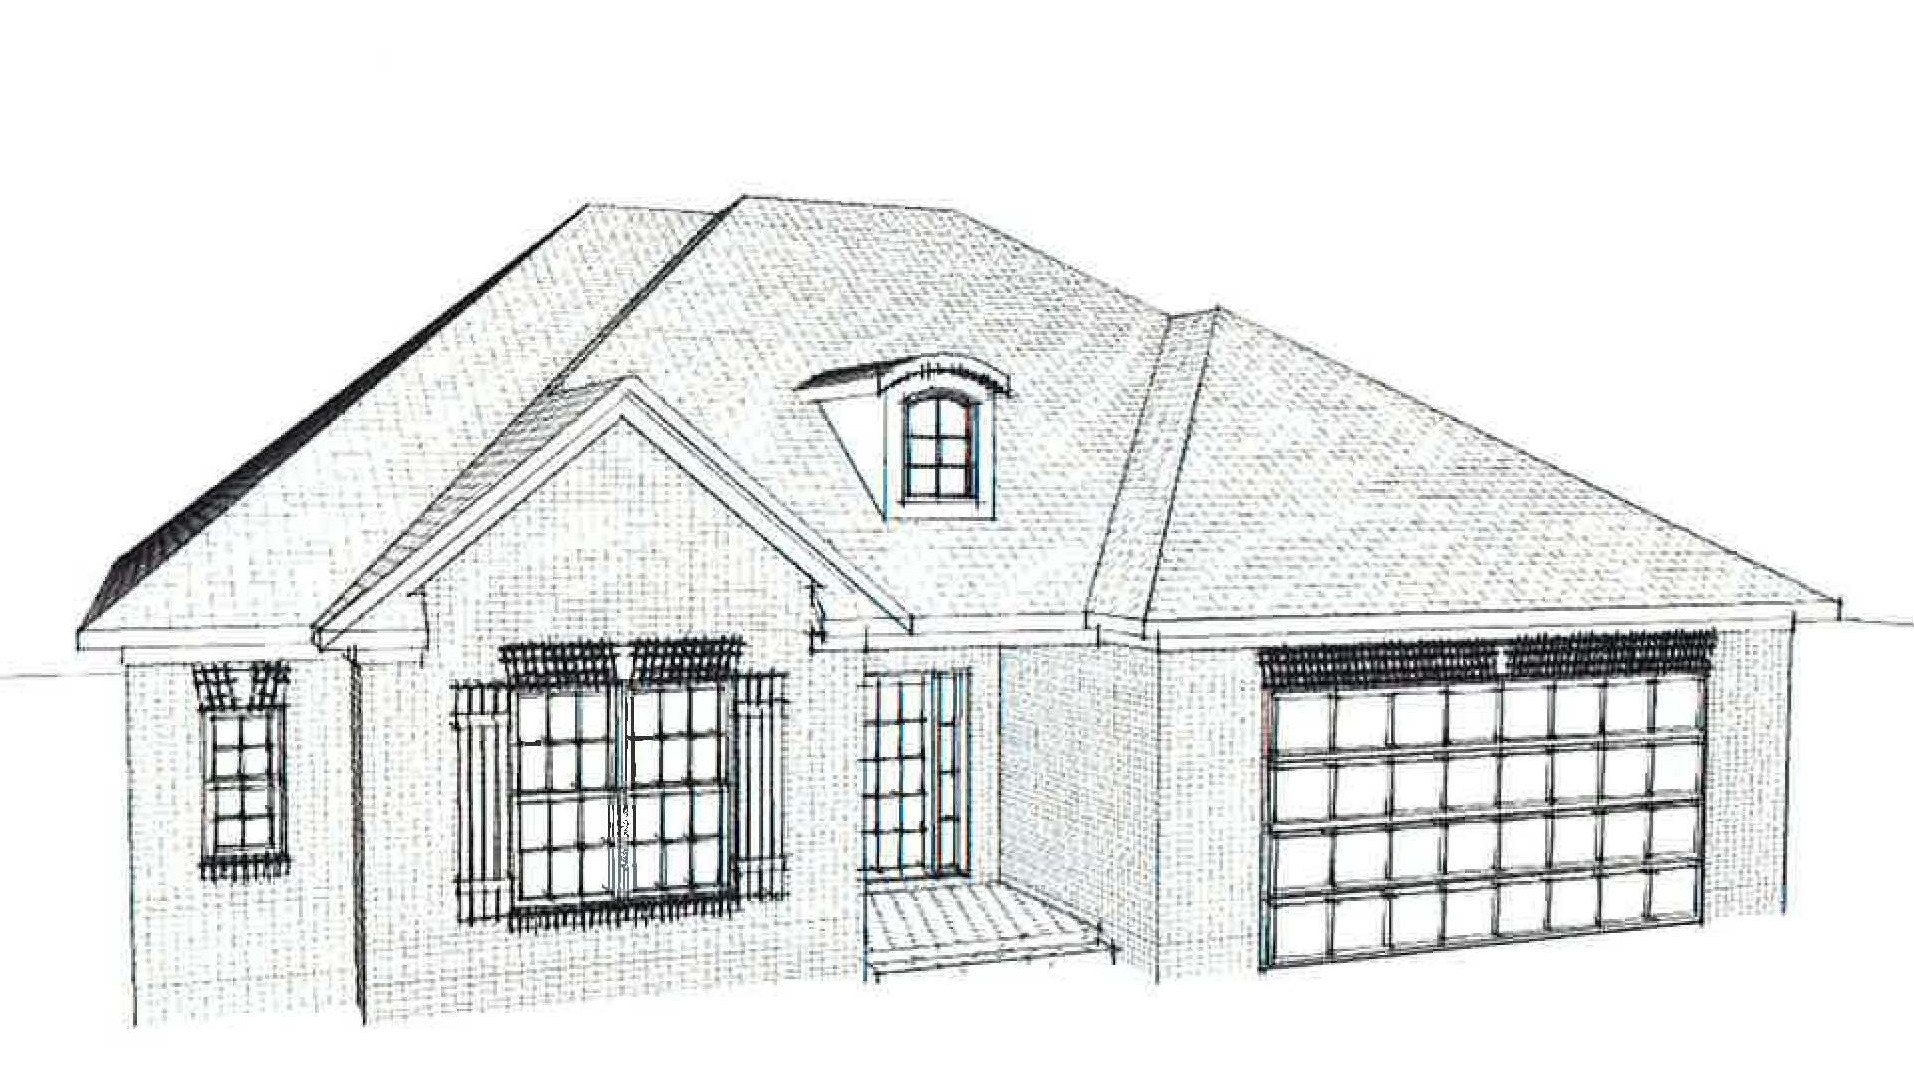 Single Family Home for Sale at 213 Burley Ridge Drive 213 Burley Ridge Drive Nicholasville, Kentucky 40356 United States